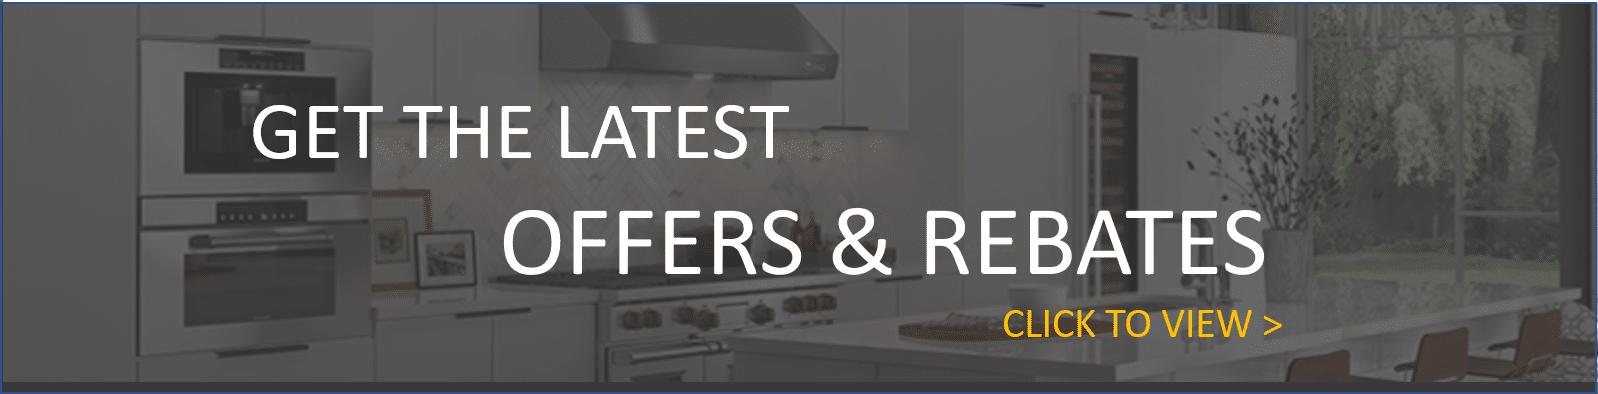 Offers & Rebates | Capital Distributing Kitchen Appliance Showroom